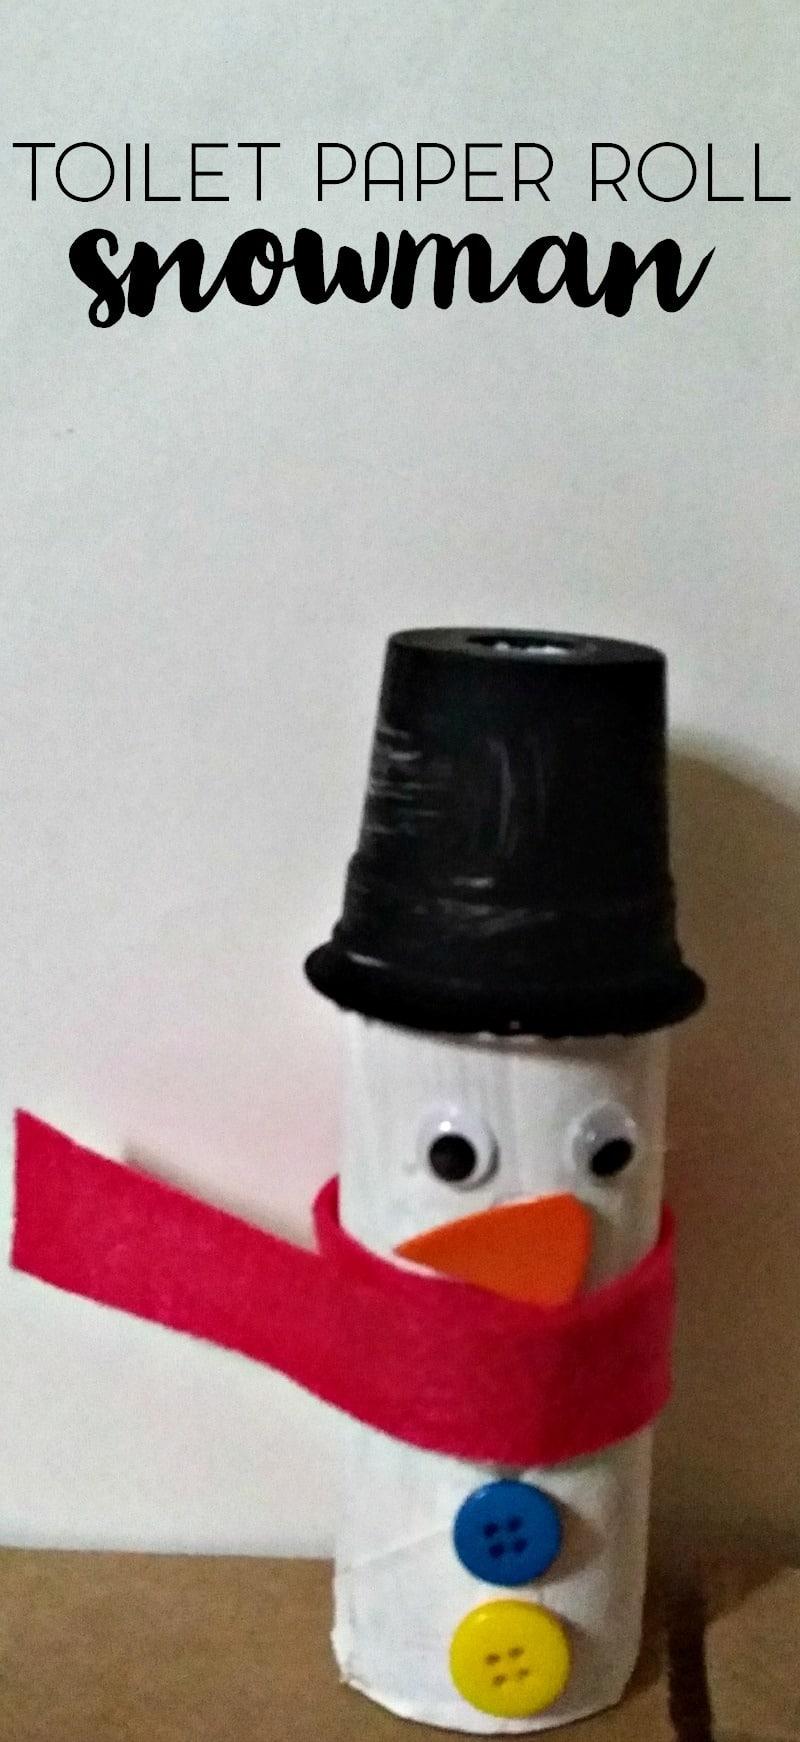 toilet-paper-roll-snowman-craft